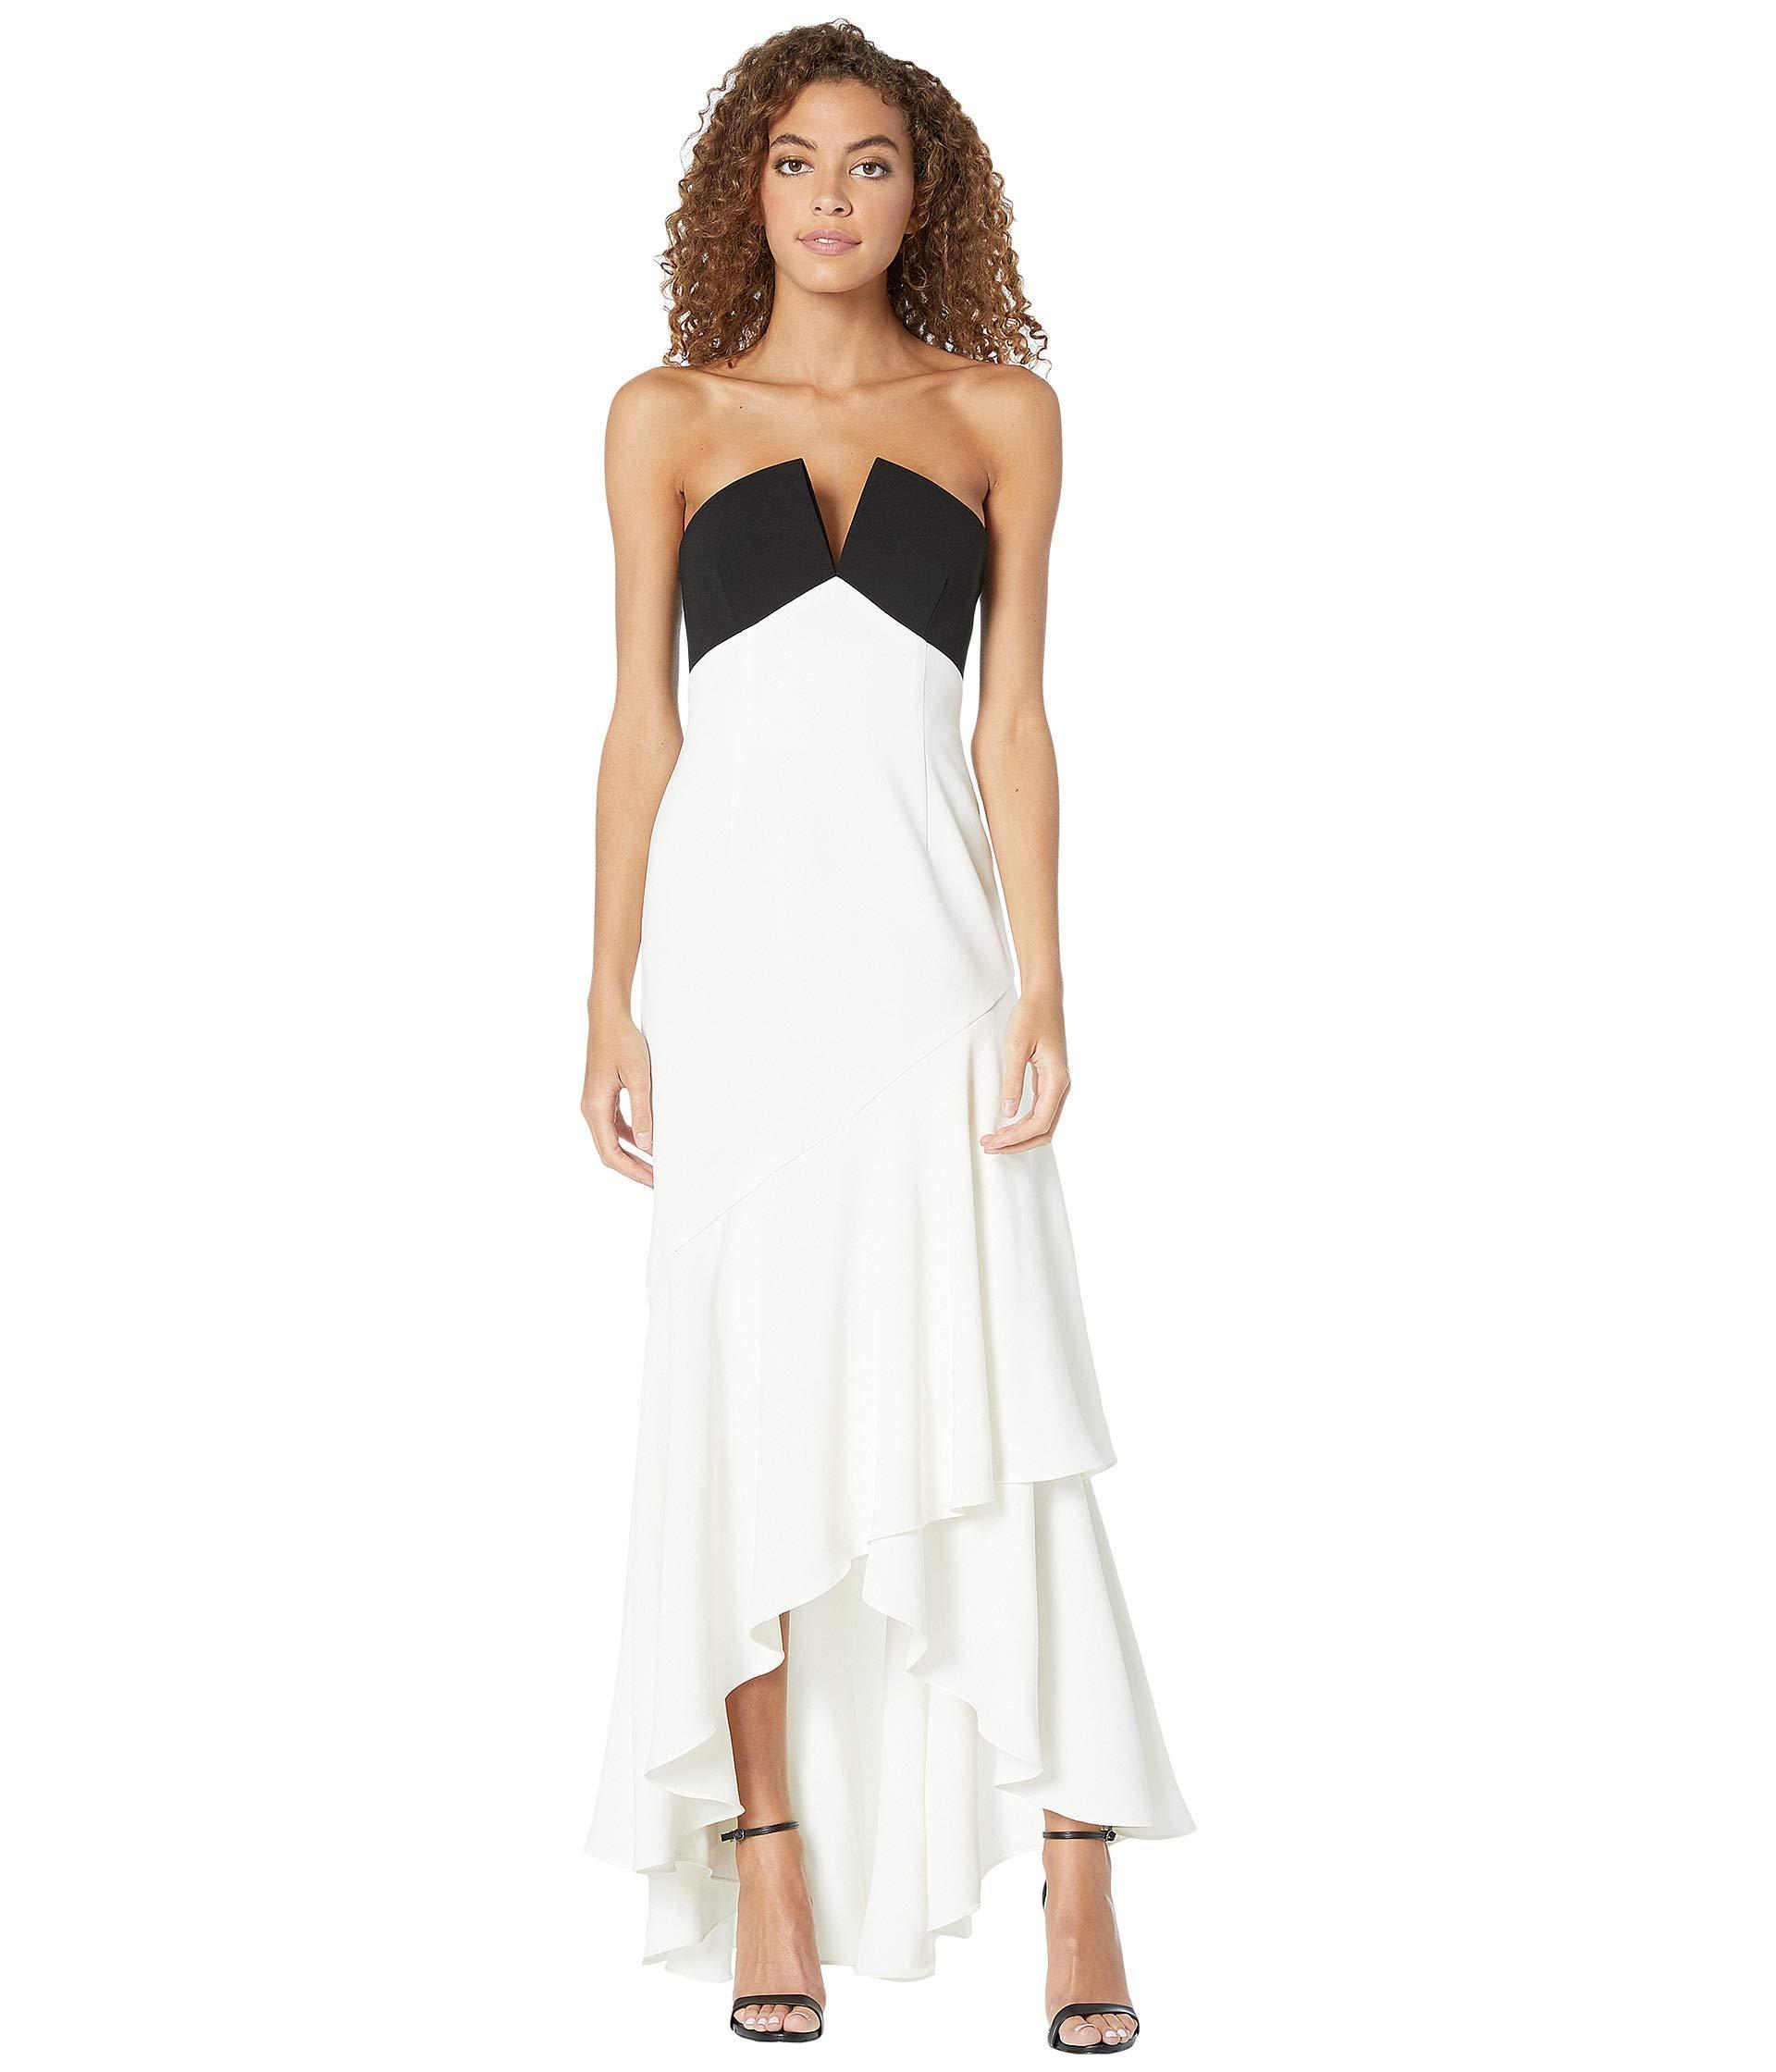 54b8ae25 JILL Jill Stuart Two-tone Gown (black/white) Women's Dress in White ...